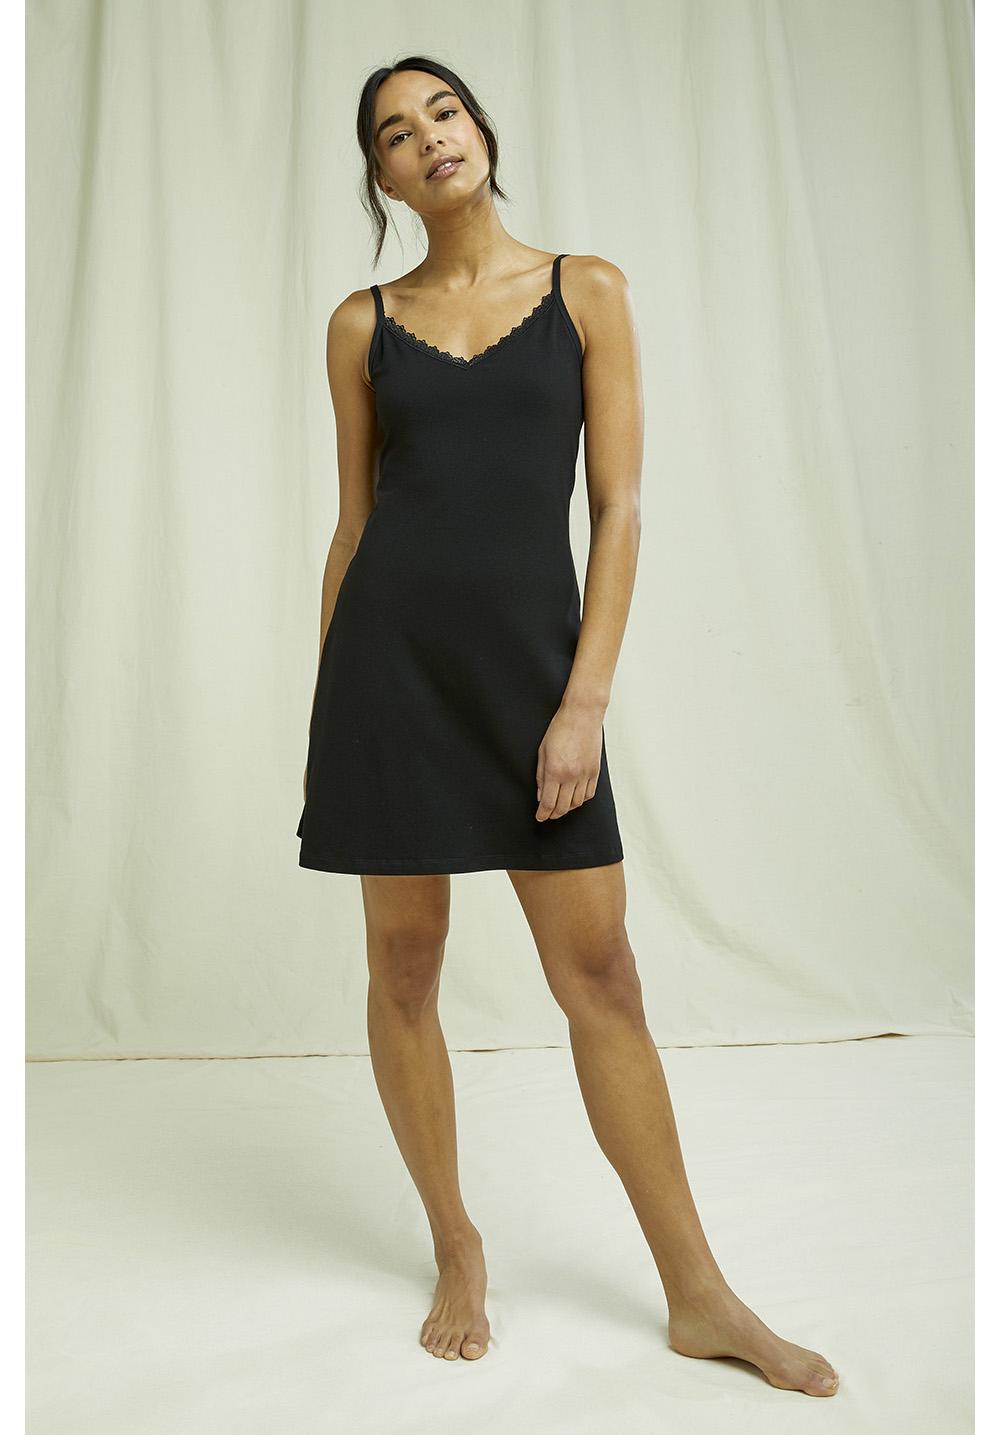 Lace Trim Slip In Black